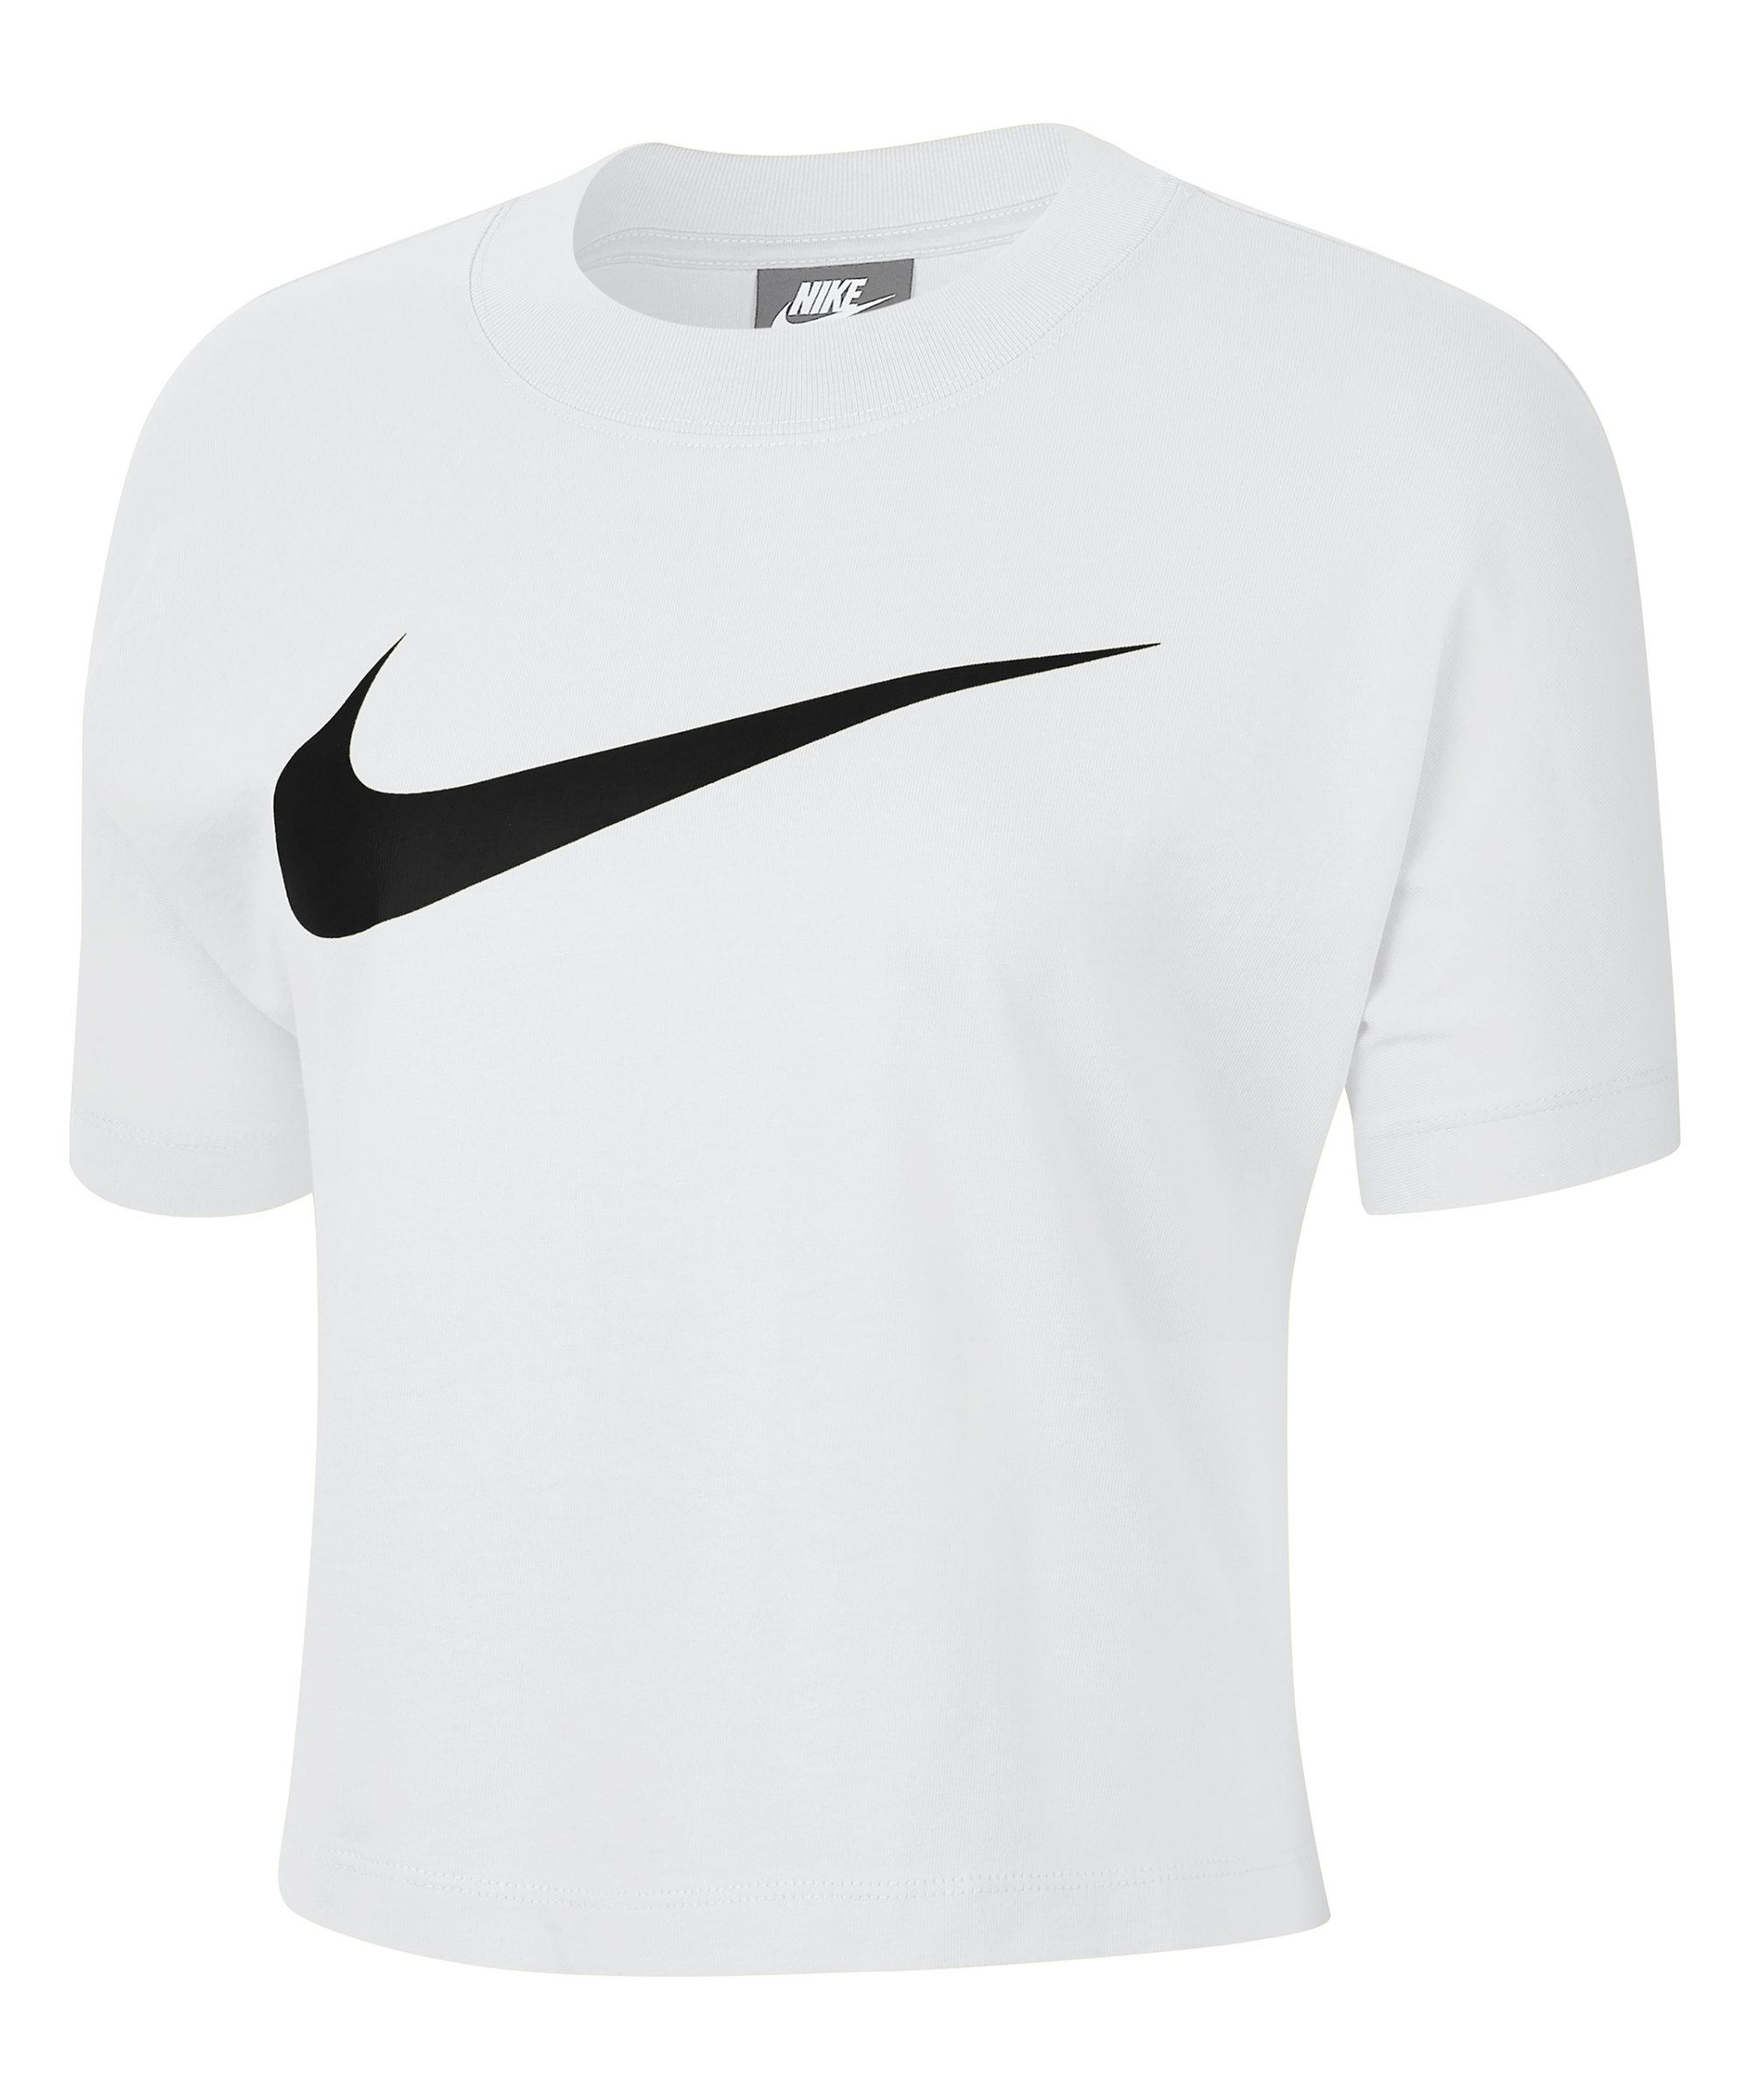 Nike Swoosh T-Shirt Damen Weiss F100 - weiss